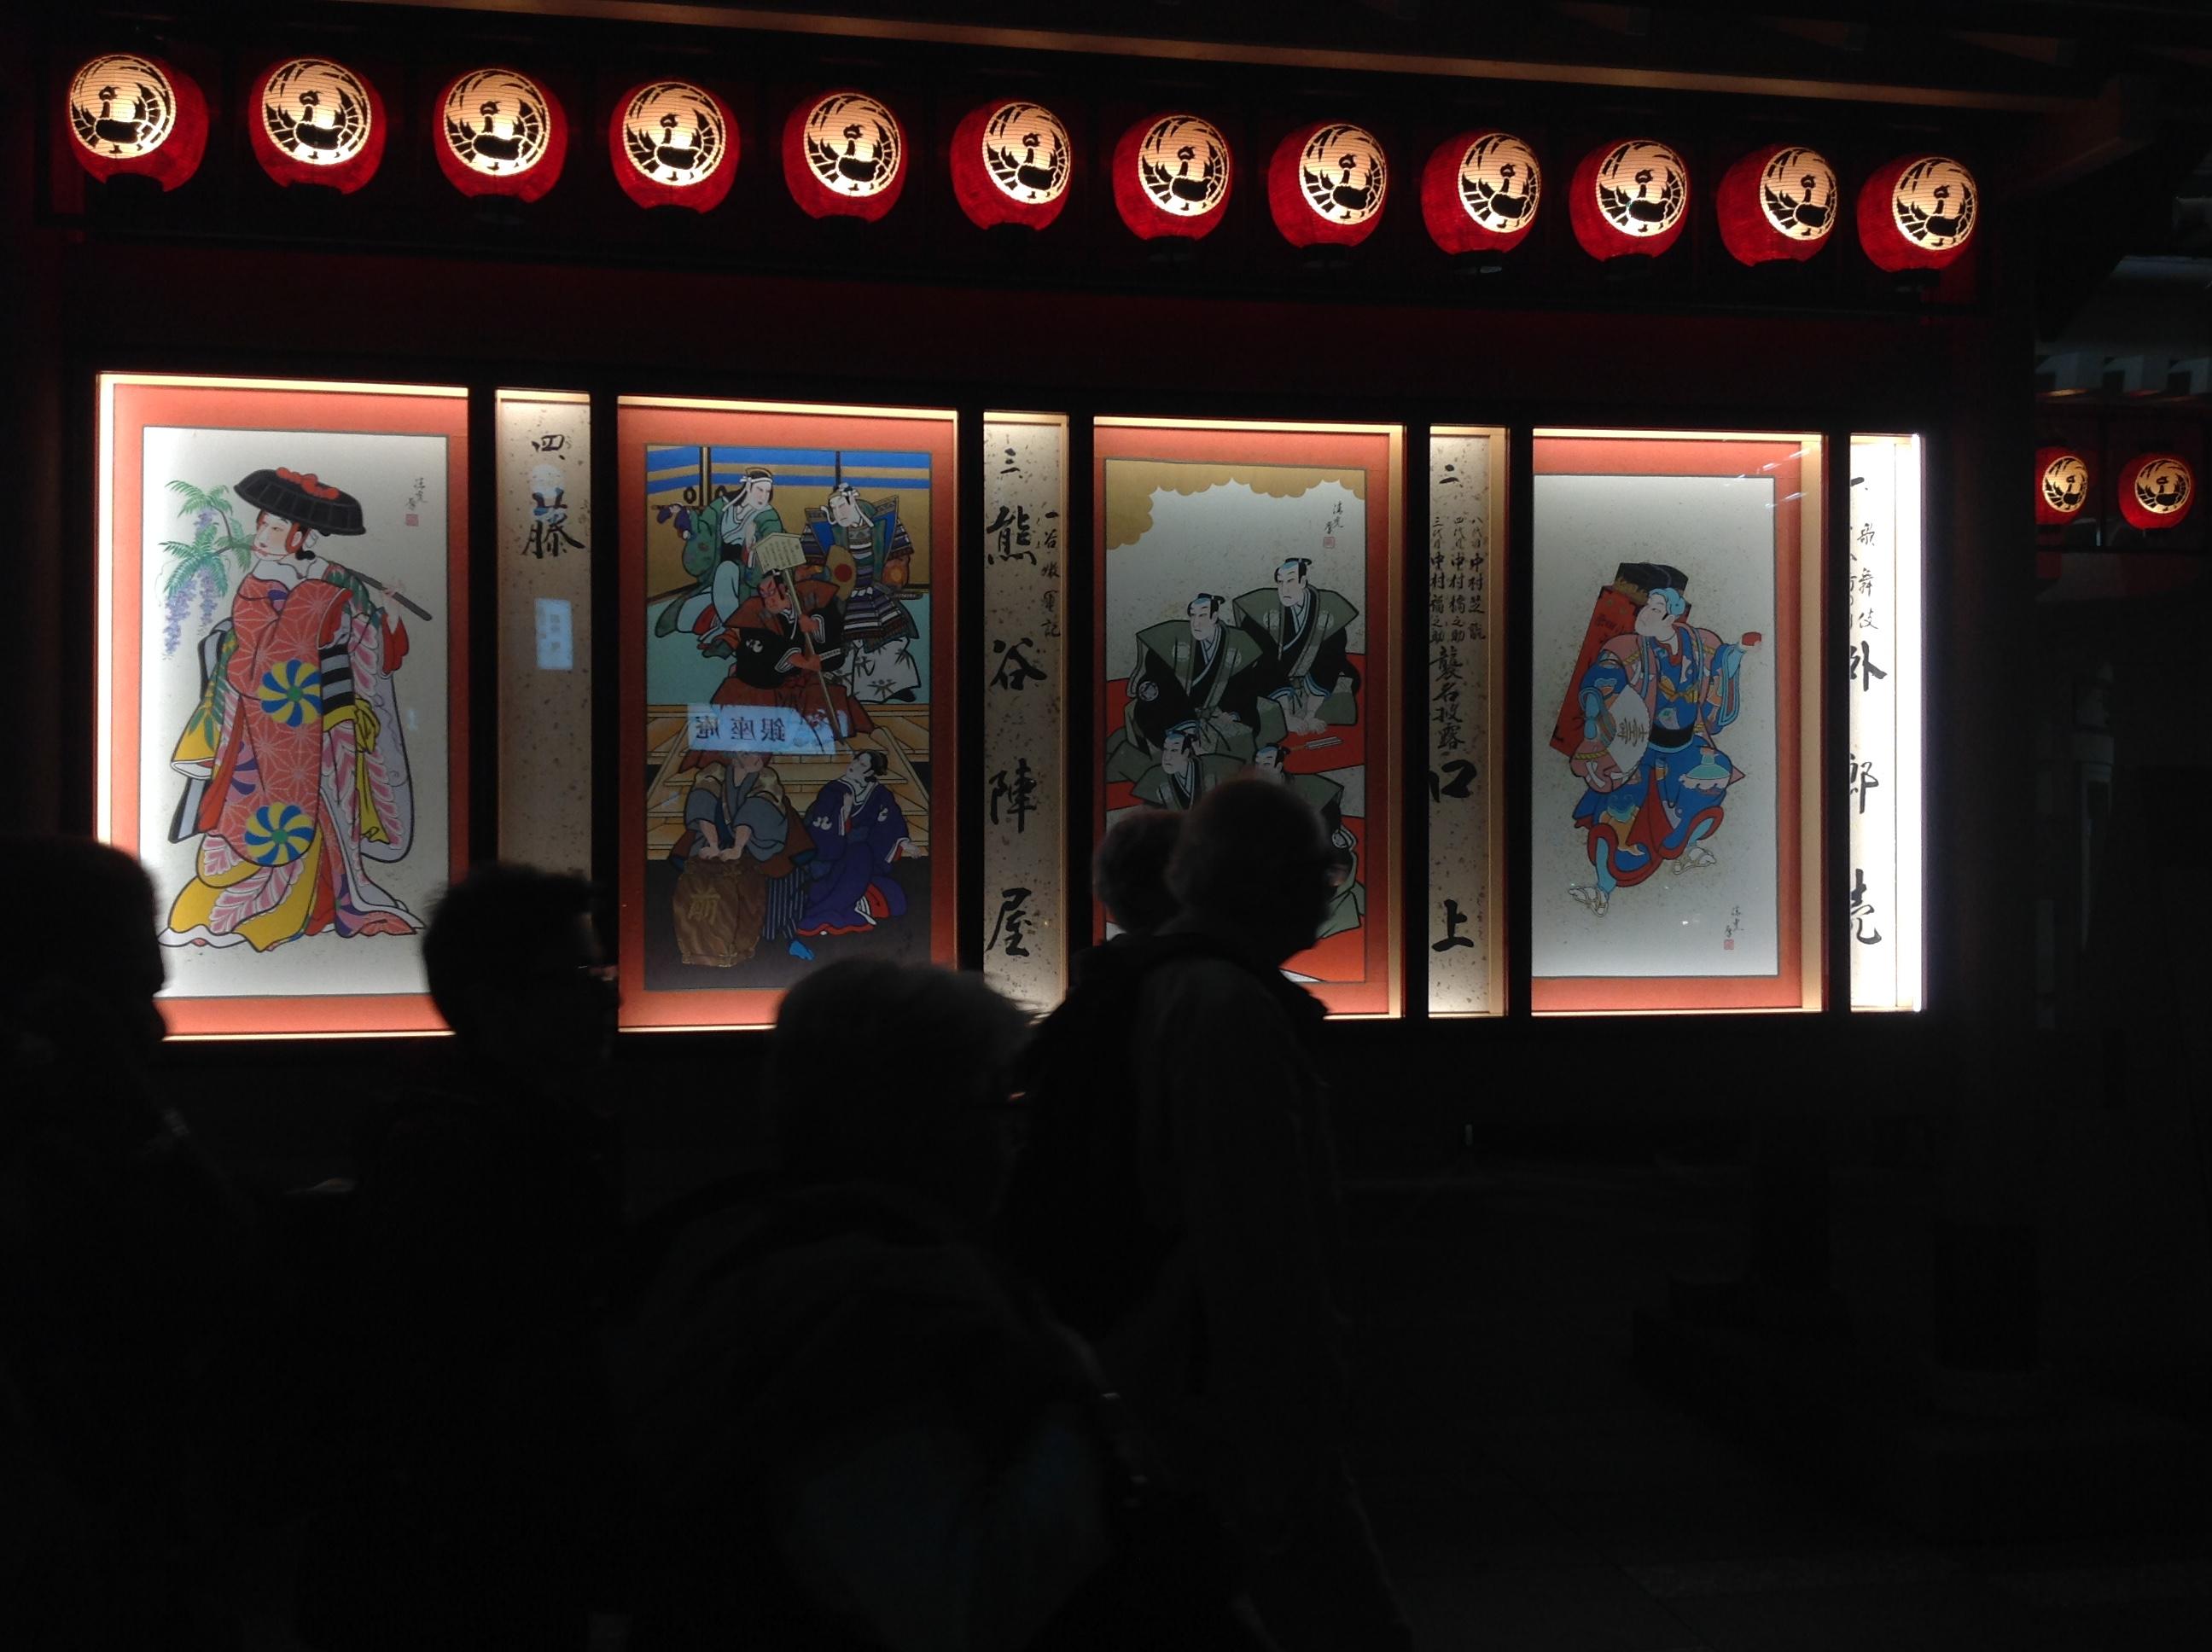 IMG_5162 japan 4 - ljsantos